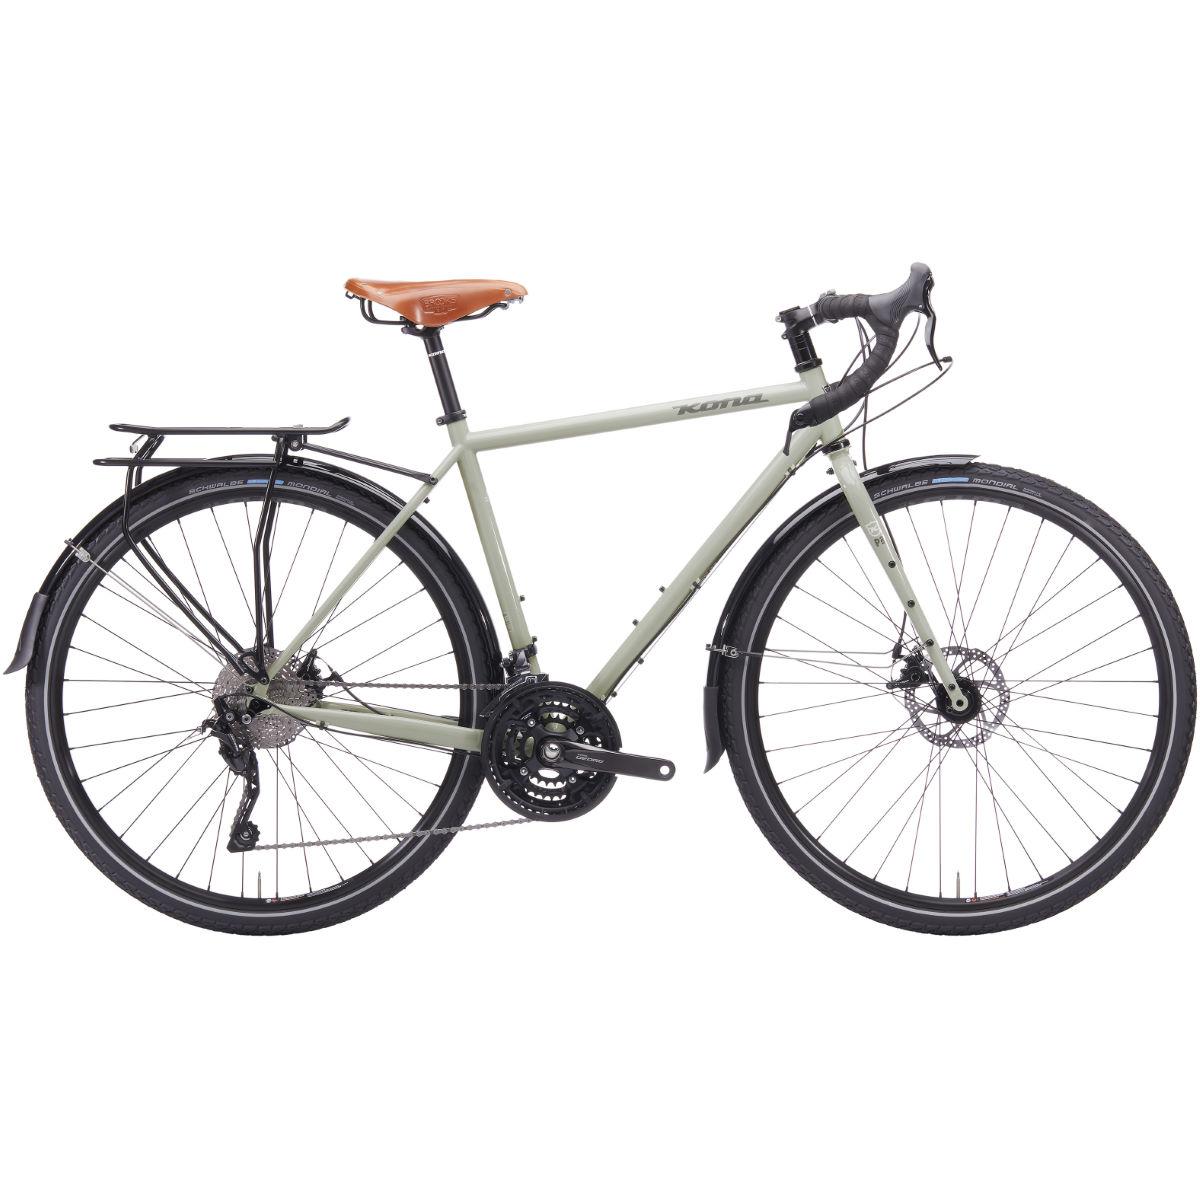 Kona Sutra Adventure 2020 Adventure Bikes